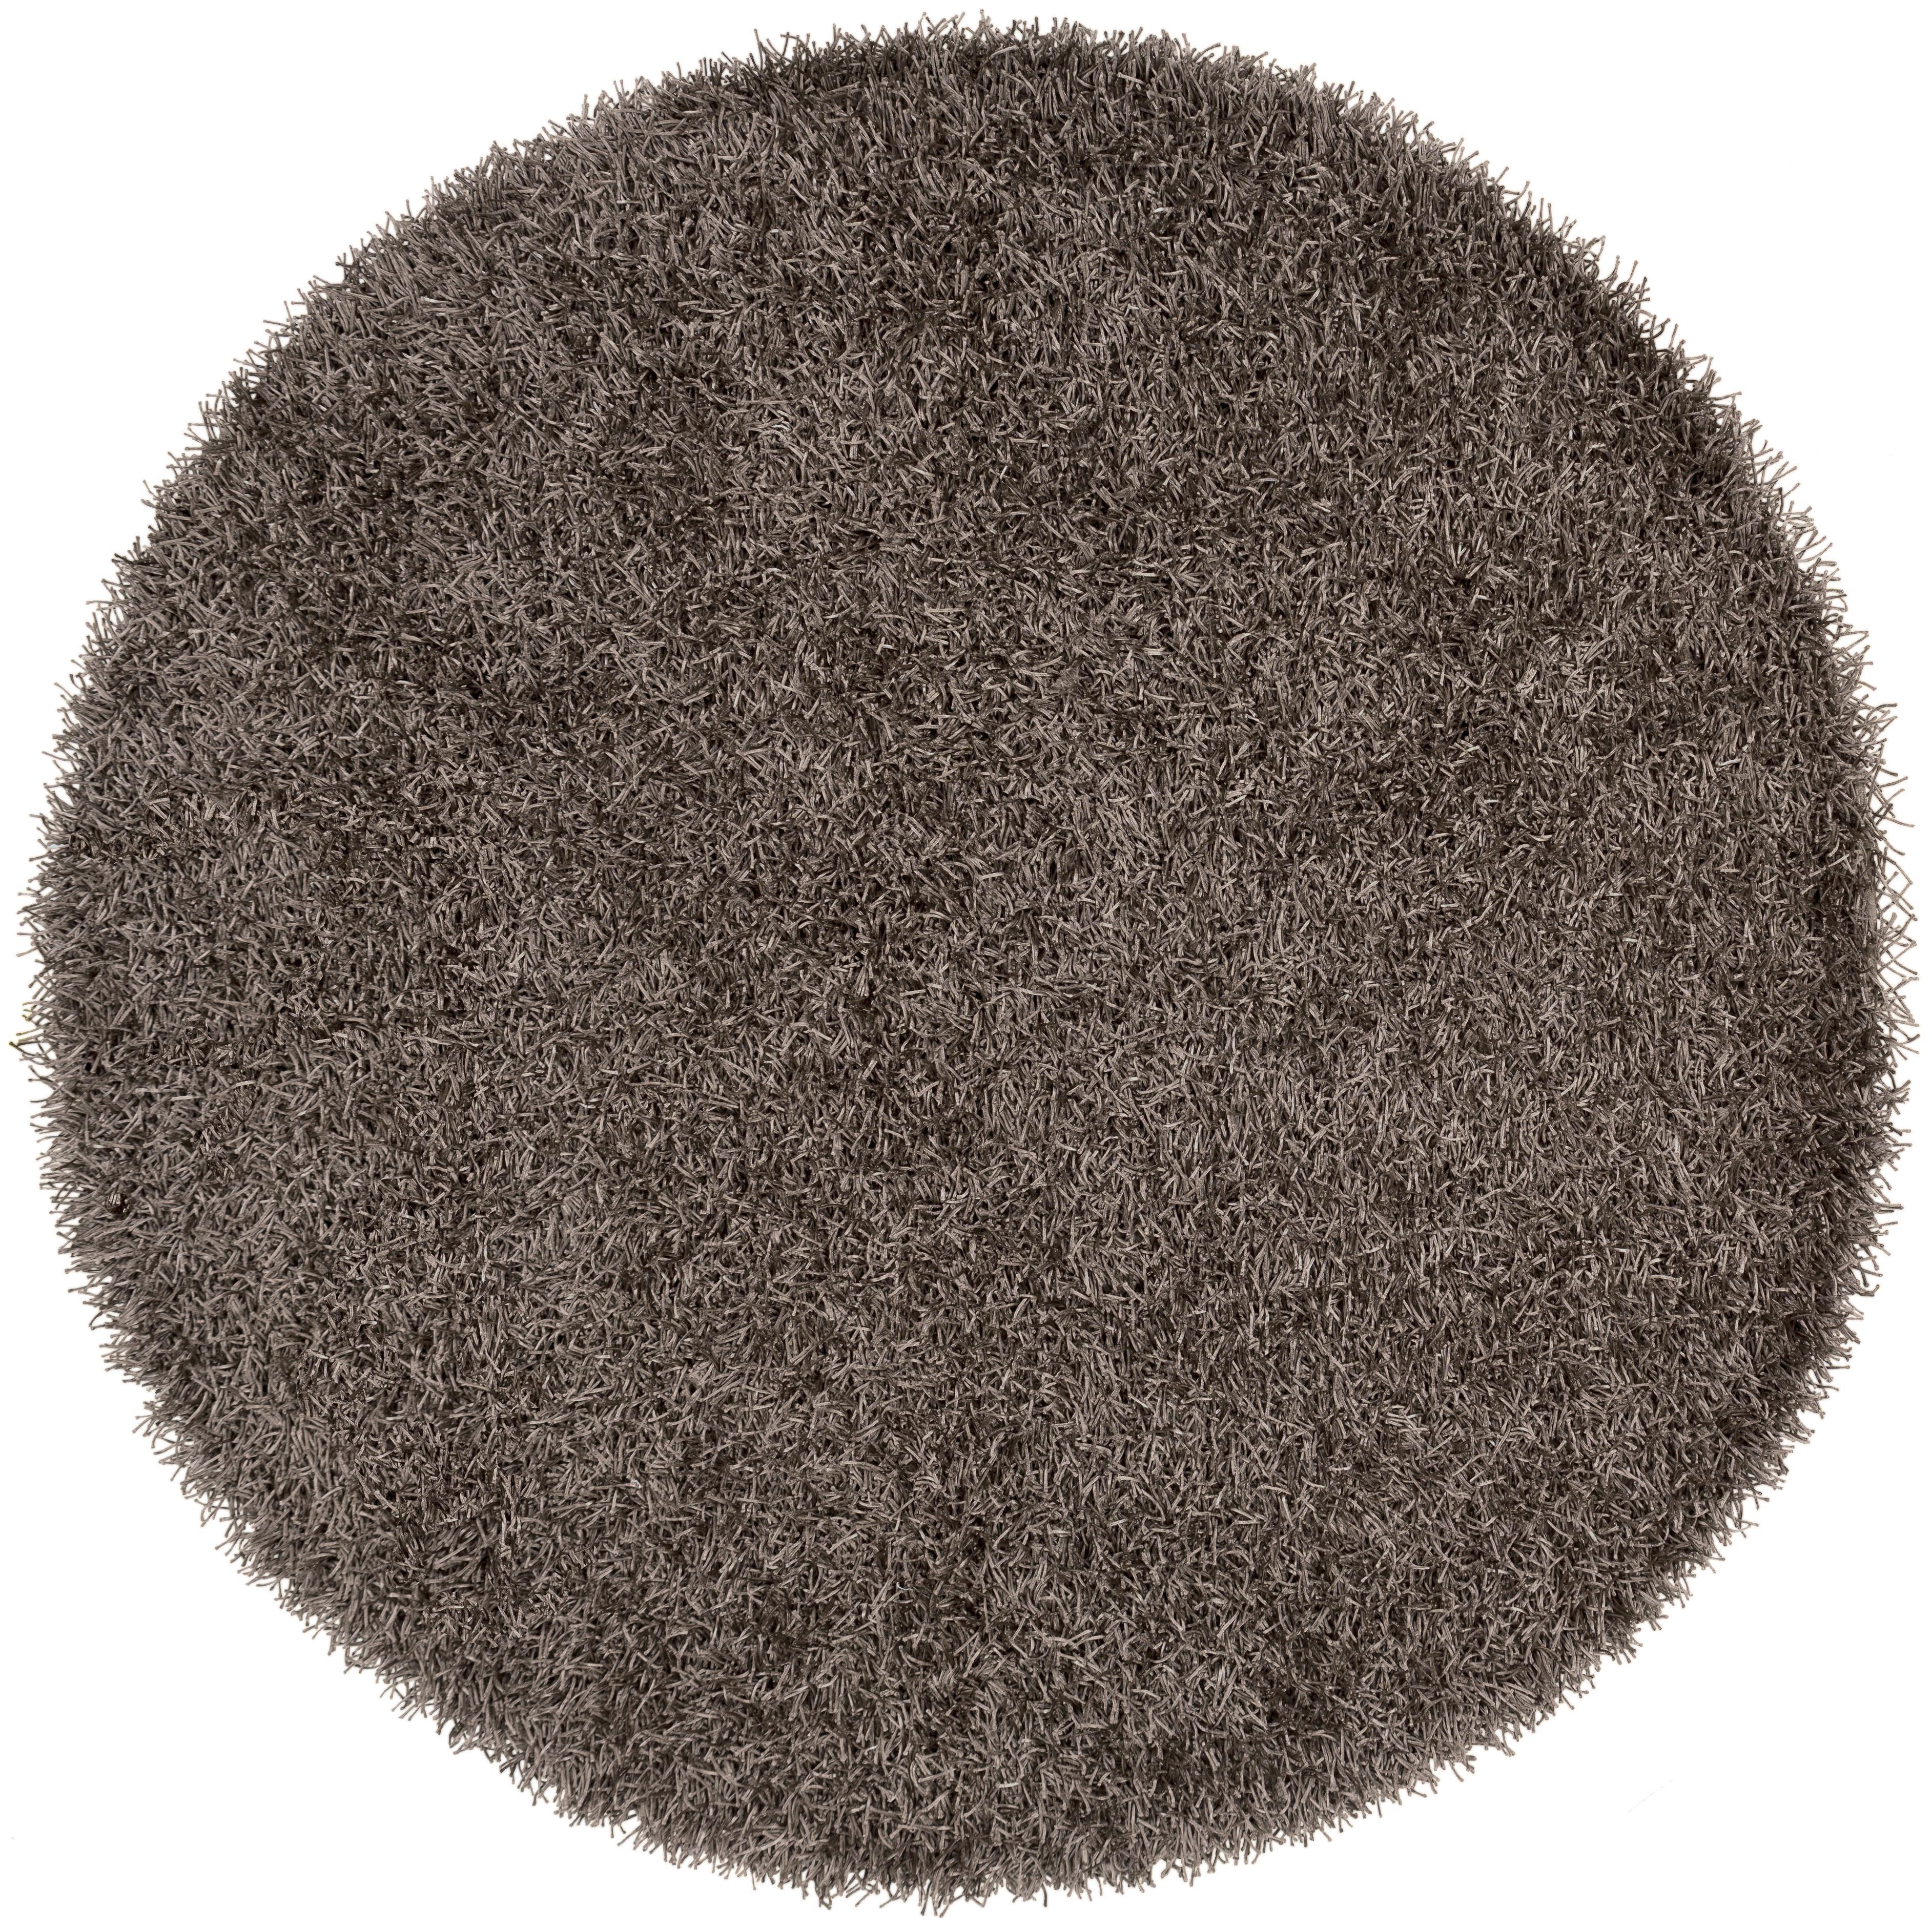 Surya Rugs Vivid 6' Round - Item Number: VIV837-6RD